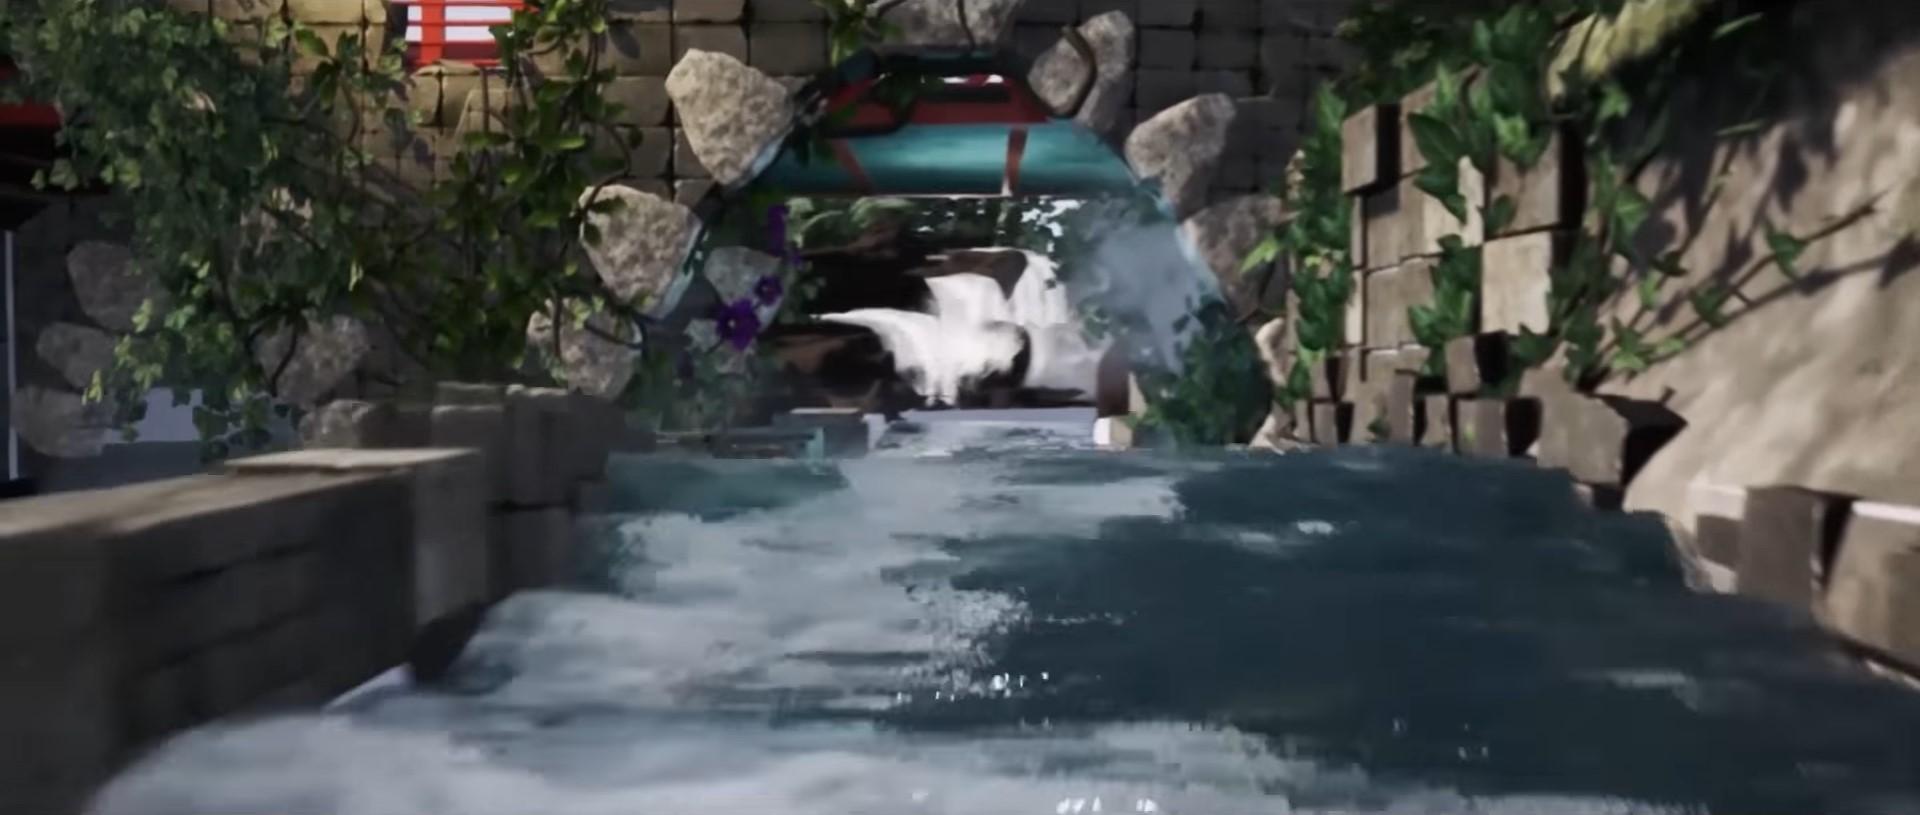 Infinity Falls Record Breaking River Rapids Ride Coming